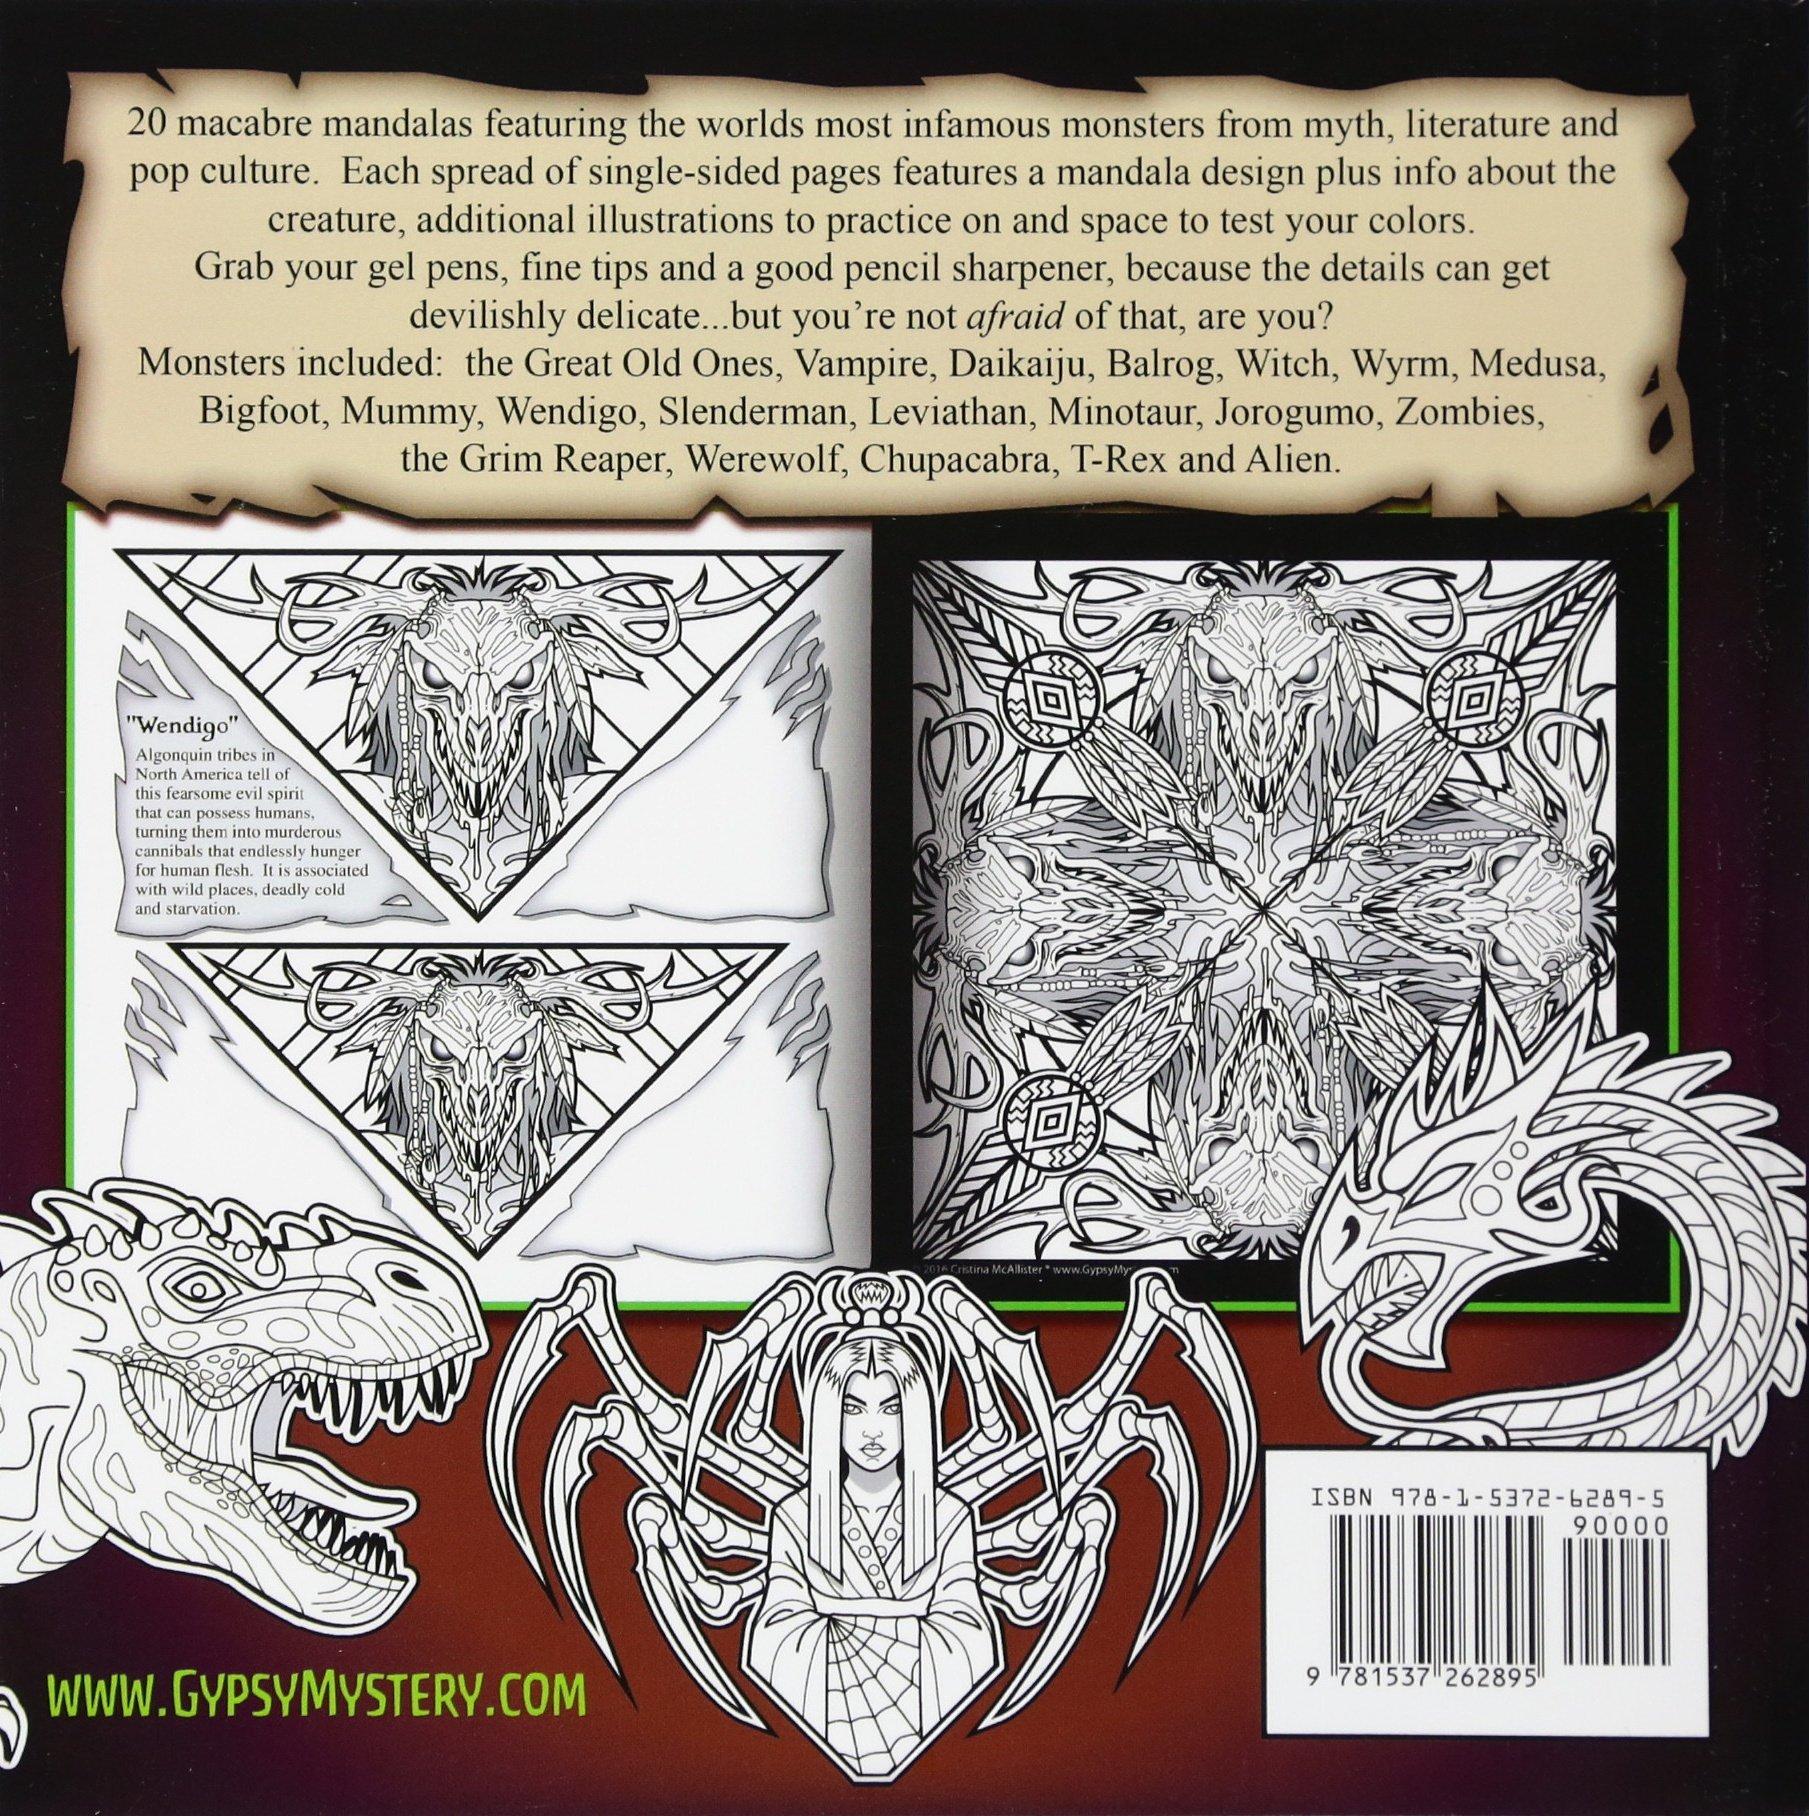 amazon com monstrous mandalas coloring book 9781537262895